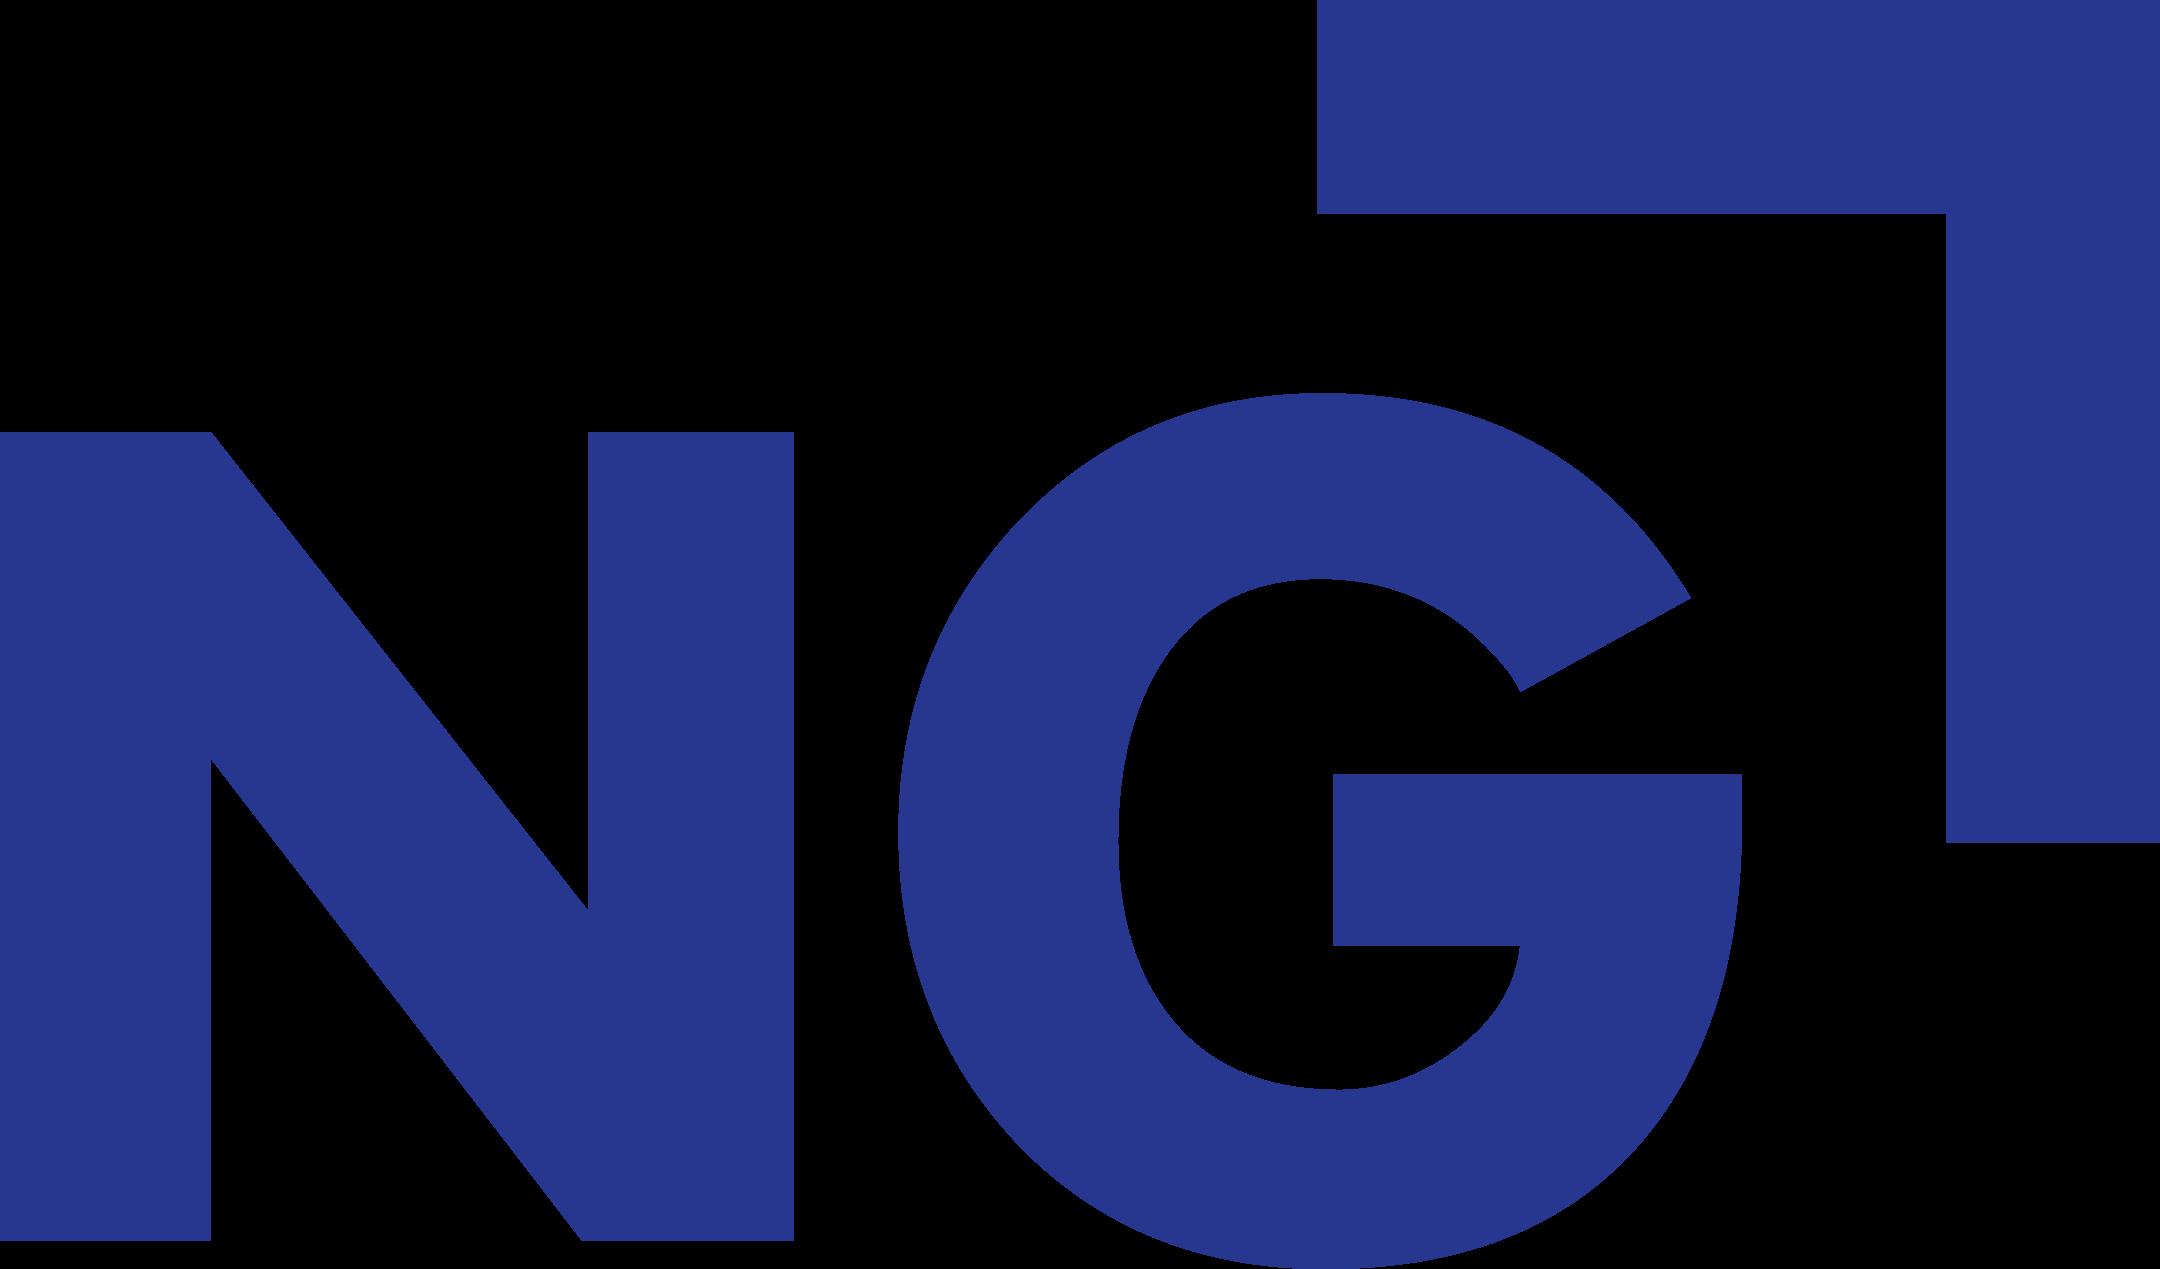 northrop grumman logo 1 - Northrop Grumman Logo